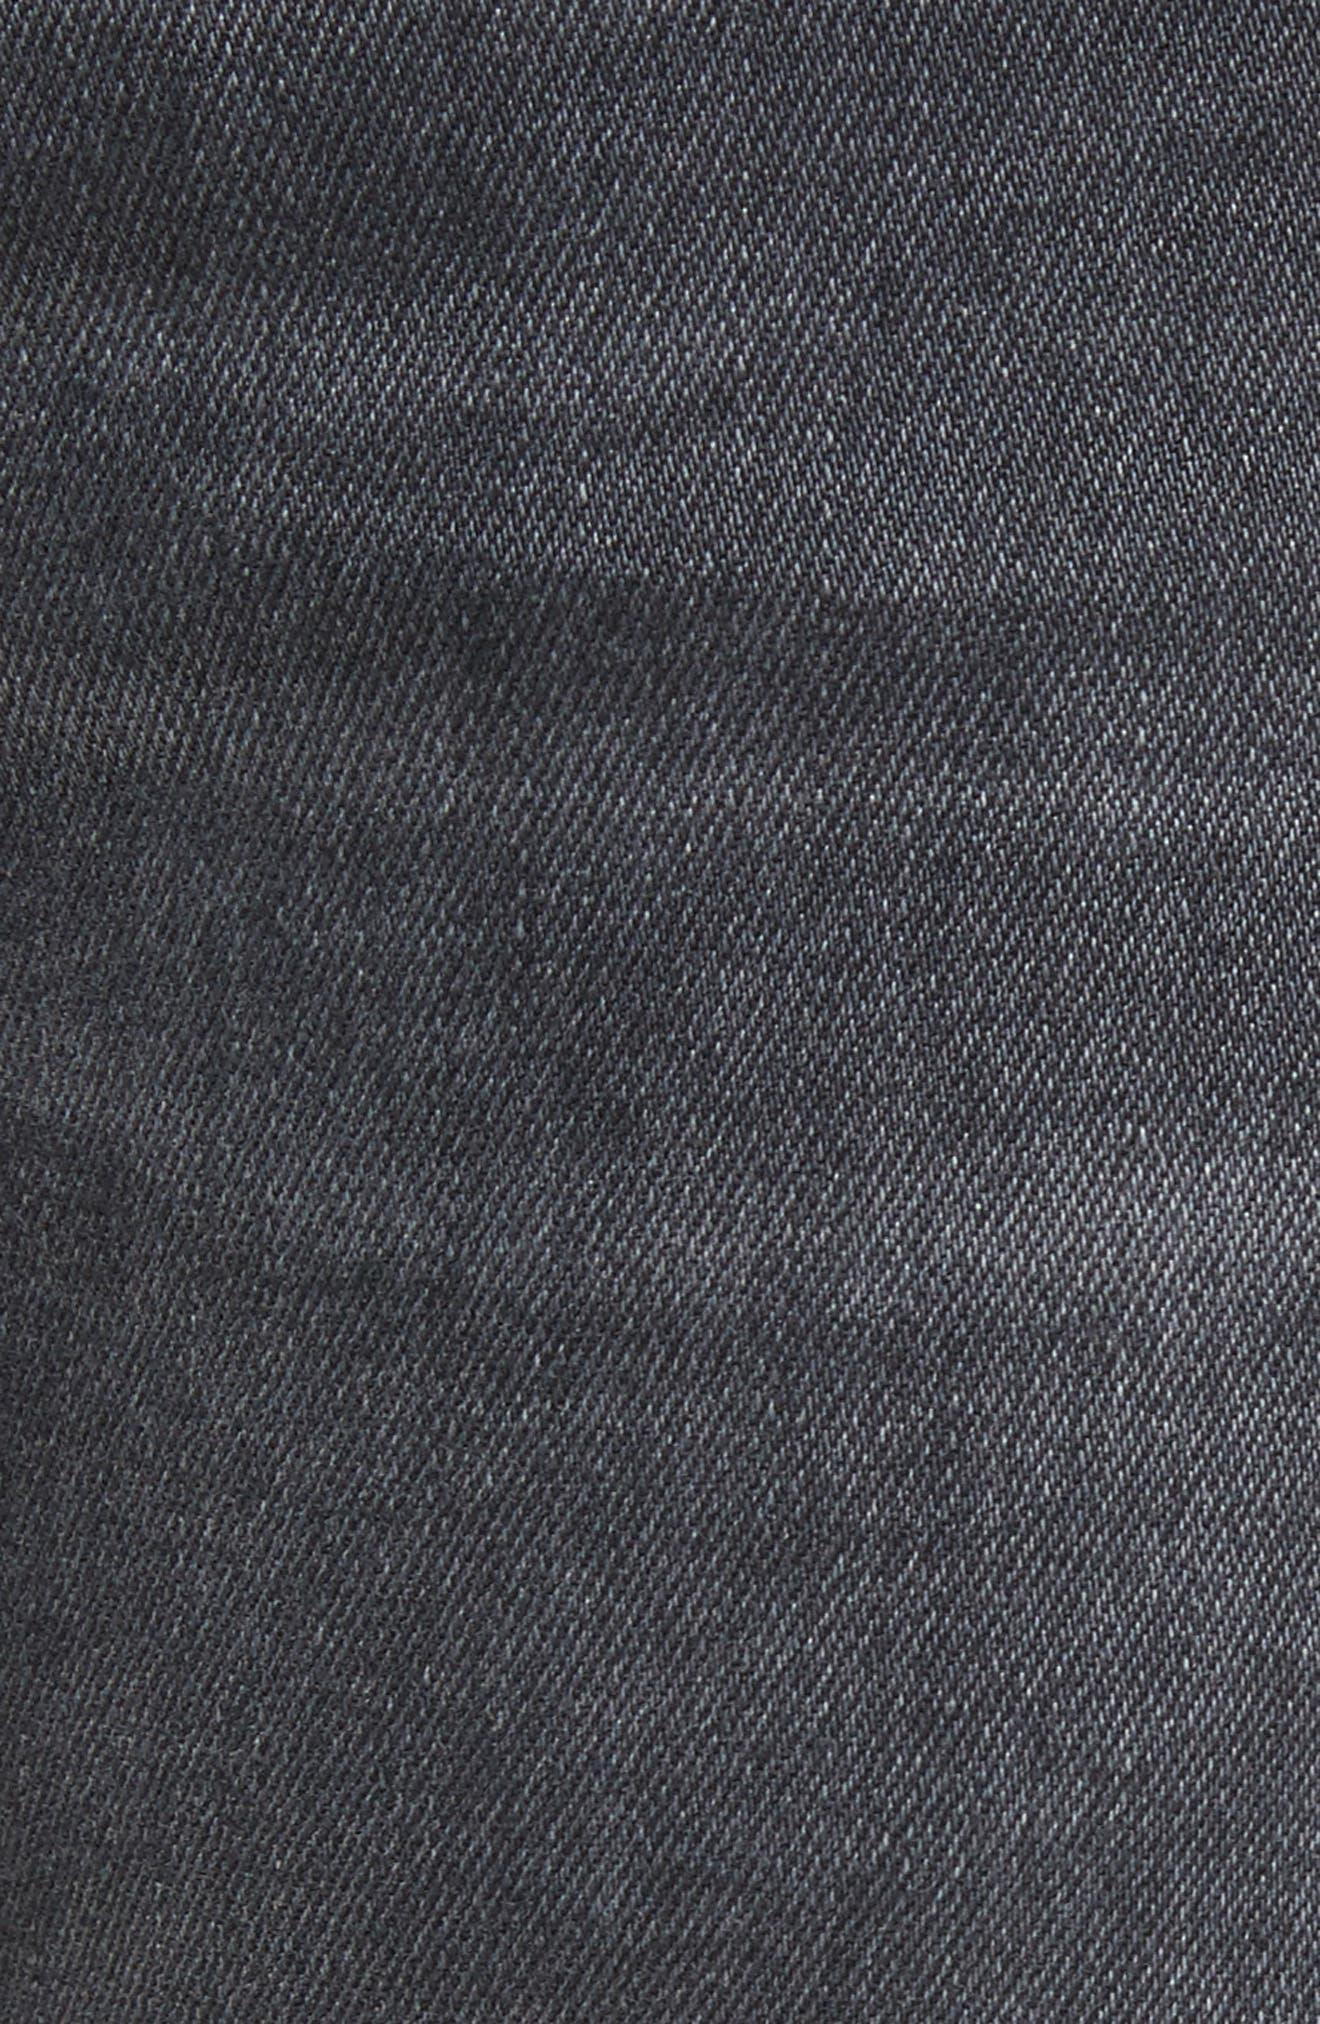 Tattenhall Washed Denim Skinny Jeans,                             Alternate thumbnail 5, color,                             022